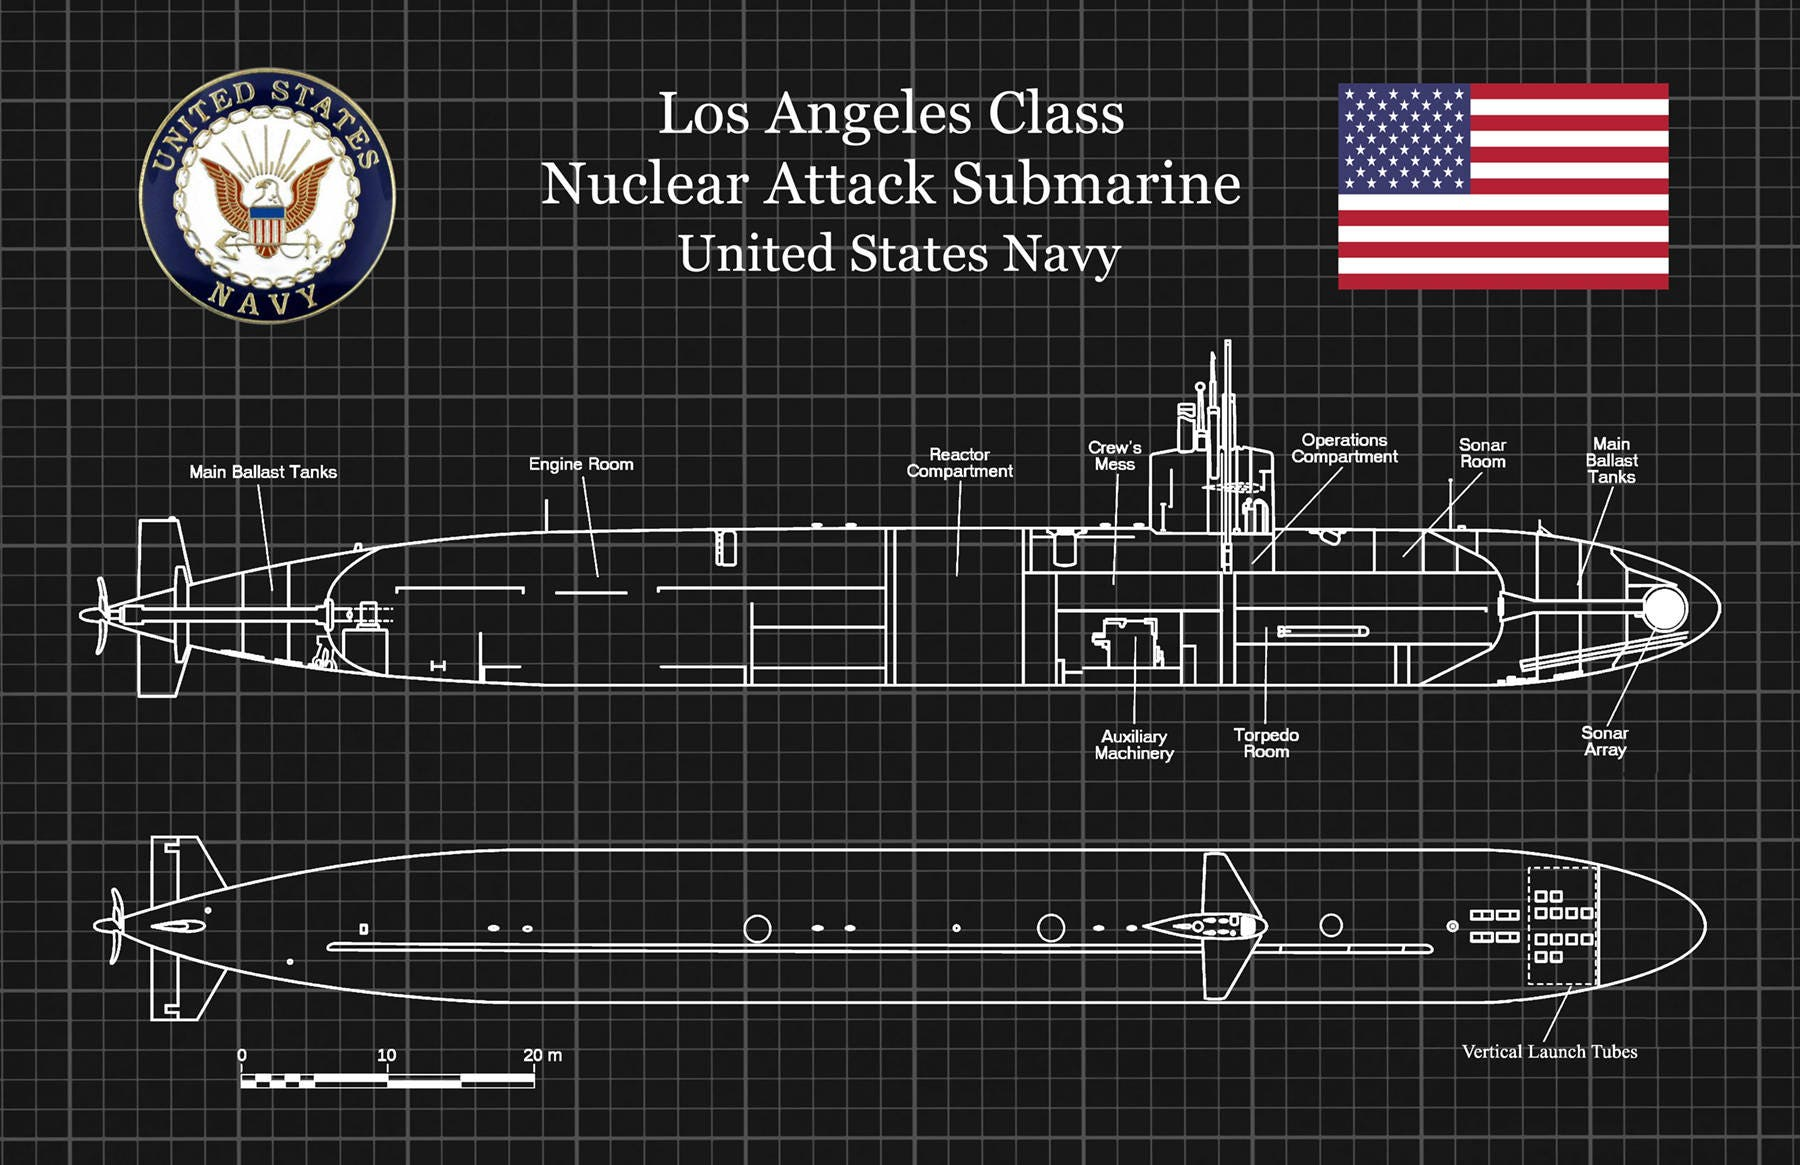 USS Los Angeles SSN-688 Class Submarine Art Print Poster